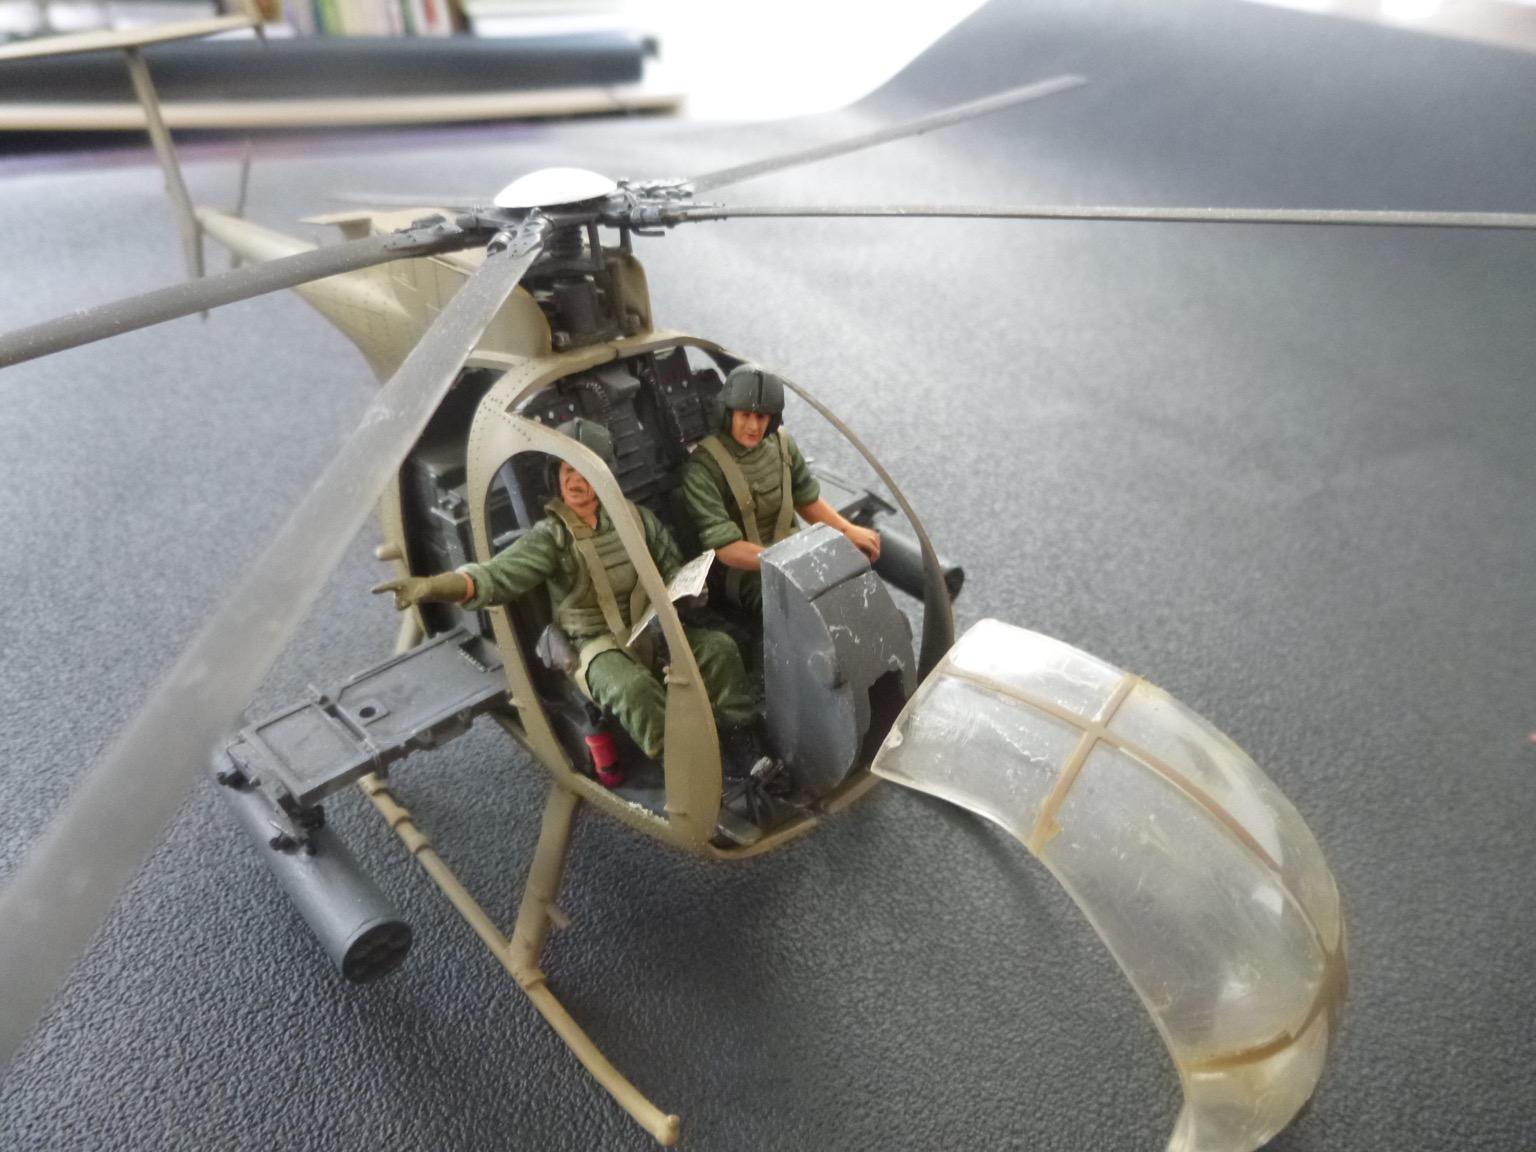 Hélicoptère AH6 little bird + équipage  Dragon 1/35 - Page 2 170709102154656338